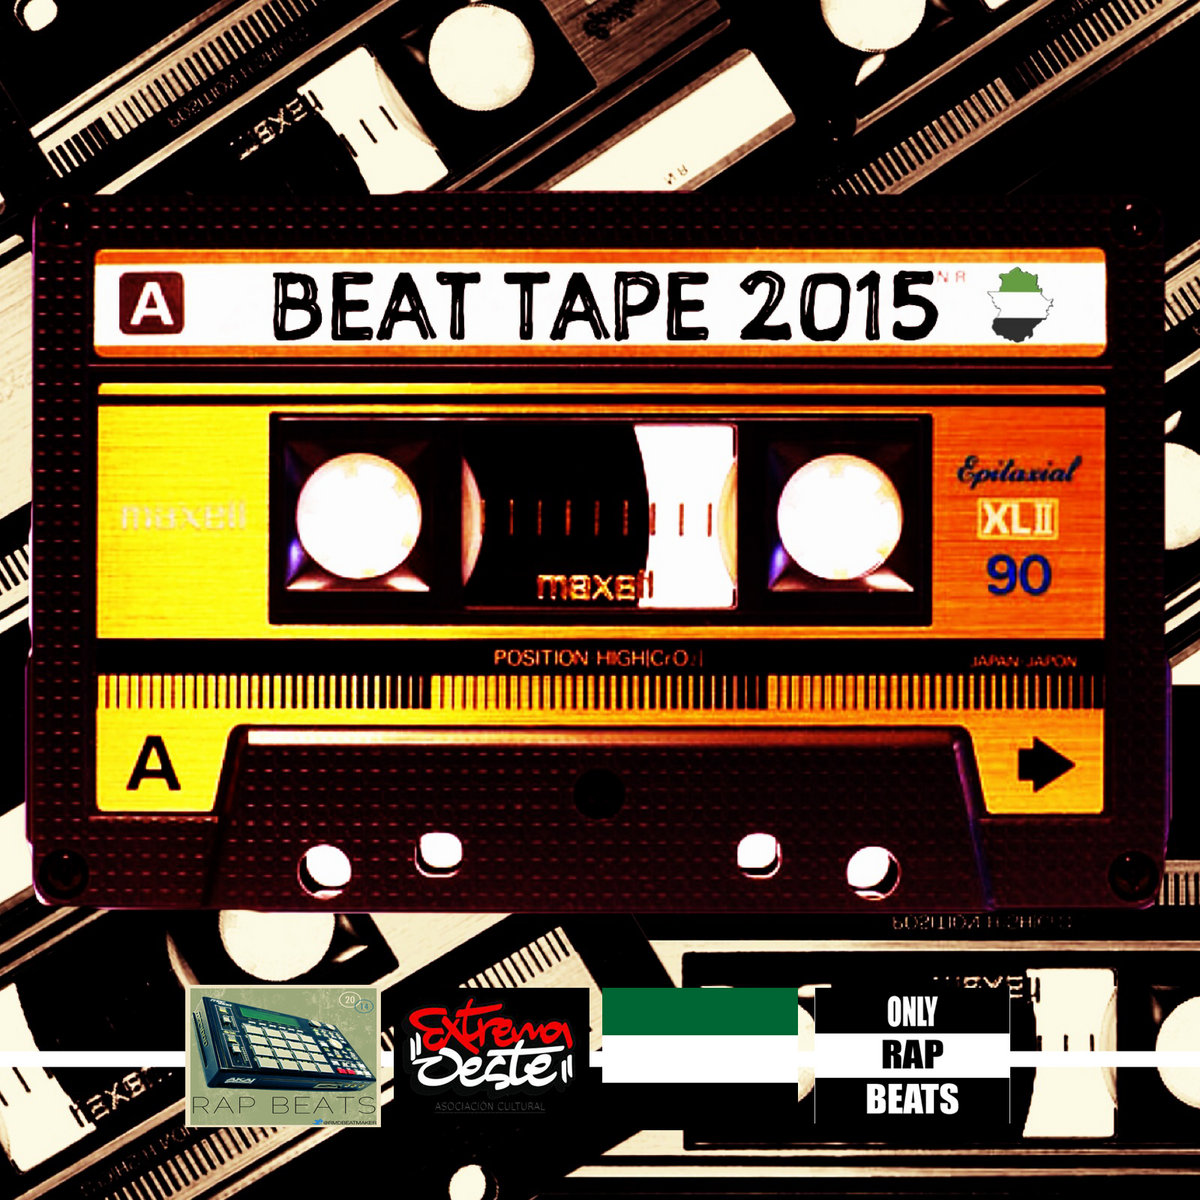 Beat Tape 2015 Extremadura Beatmakers (FREE DOWNLOAD) | DJ Tools 4